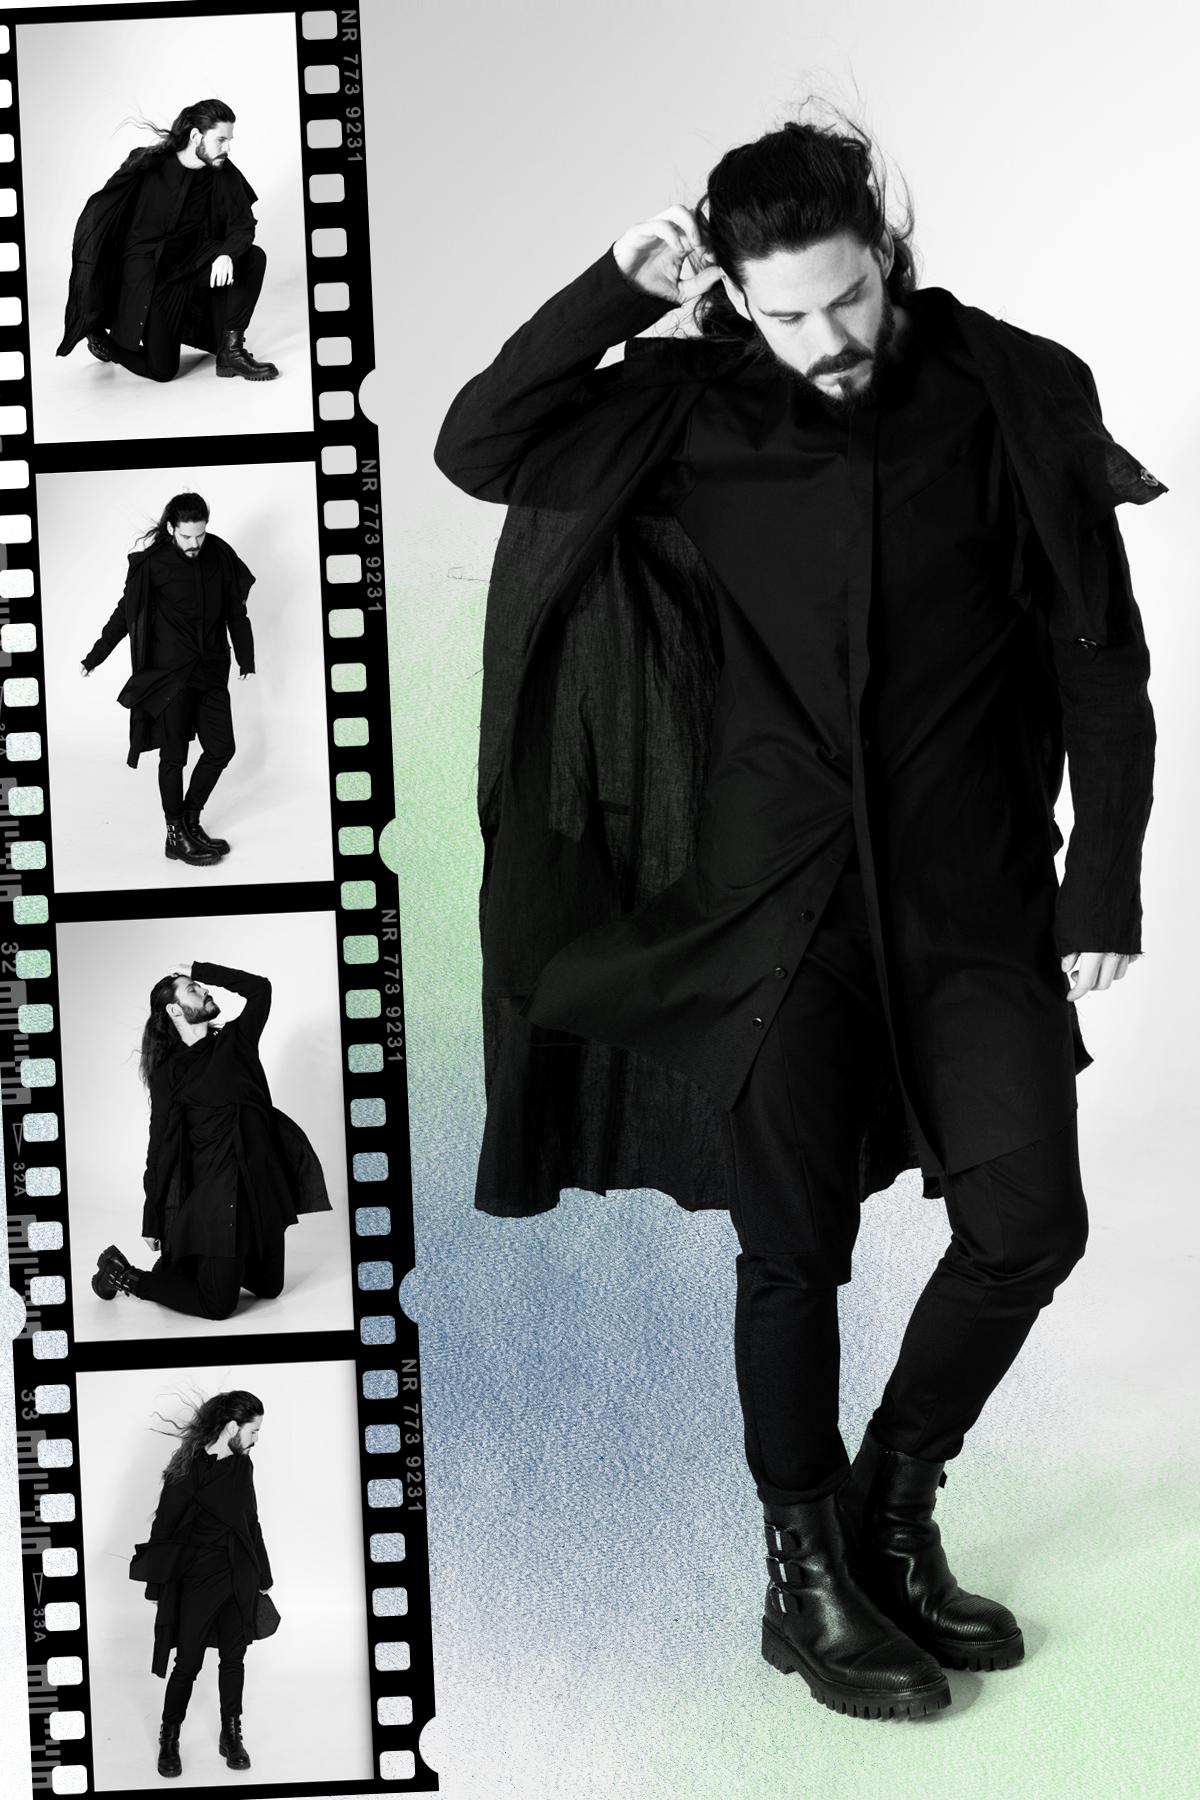 Editorial-Aleks-Kurkowski-Malefashion-Designer-Mode-High-Fashion-Avantgarde-Menswear-04